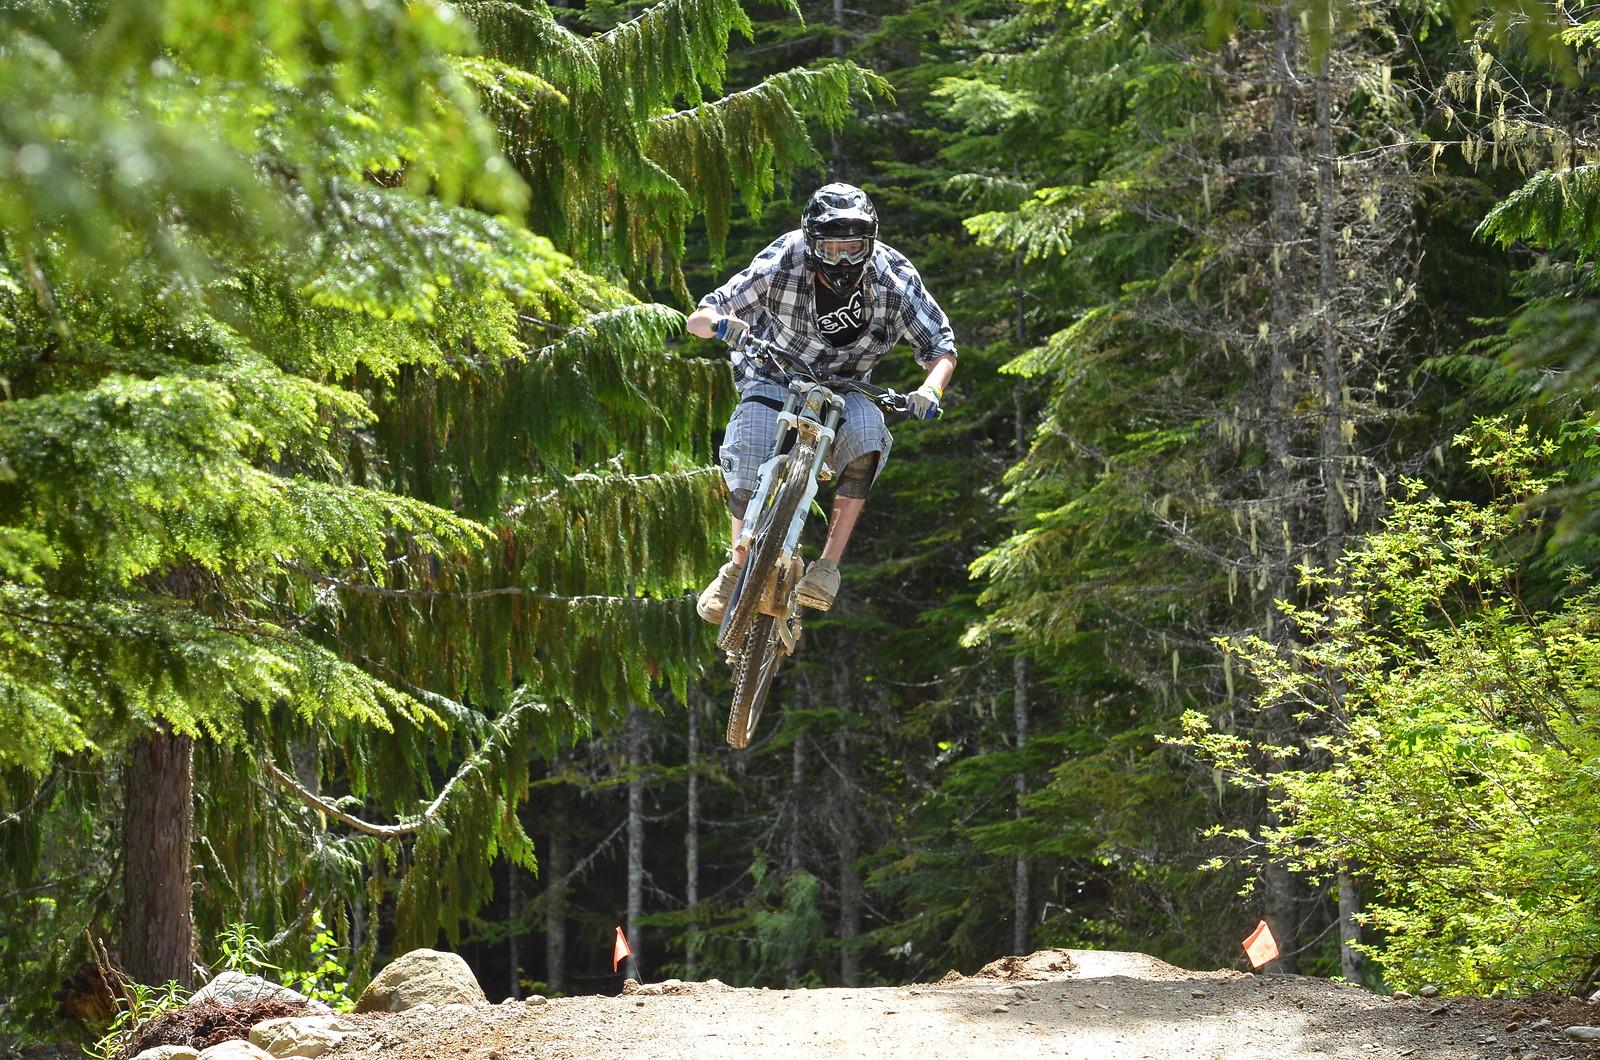 Dirt Merchant - Moosey - Mountain Biking Pictures - Vital MTB